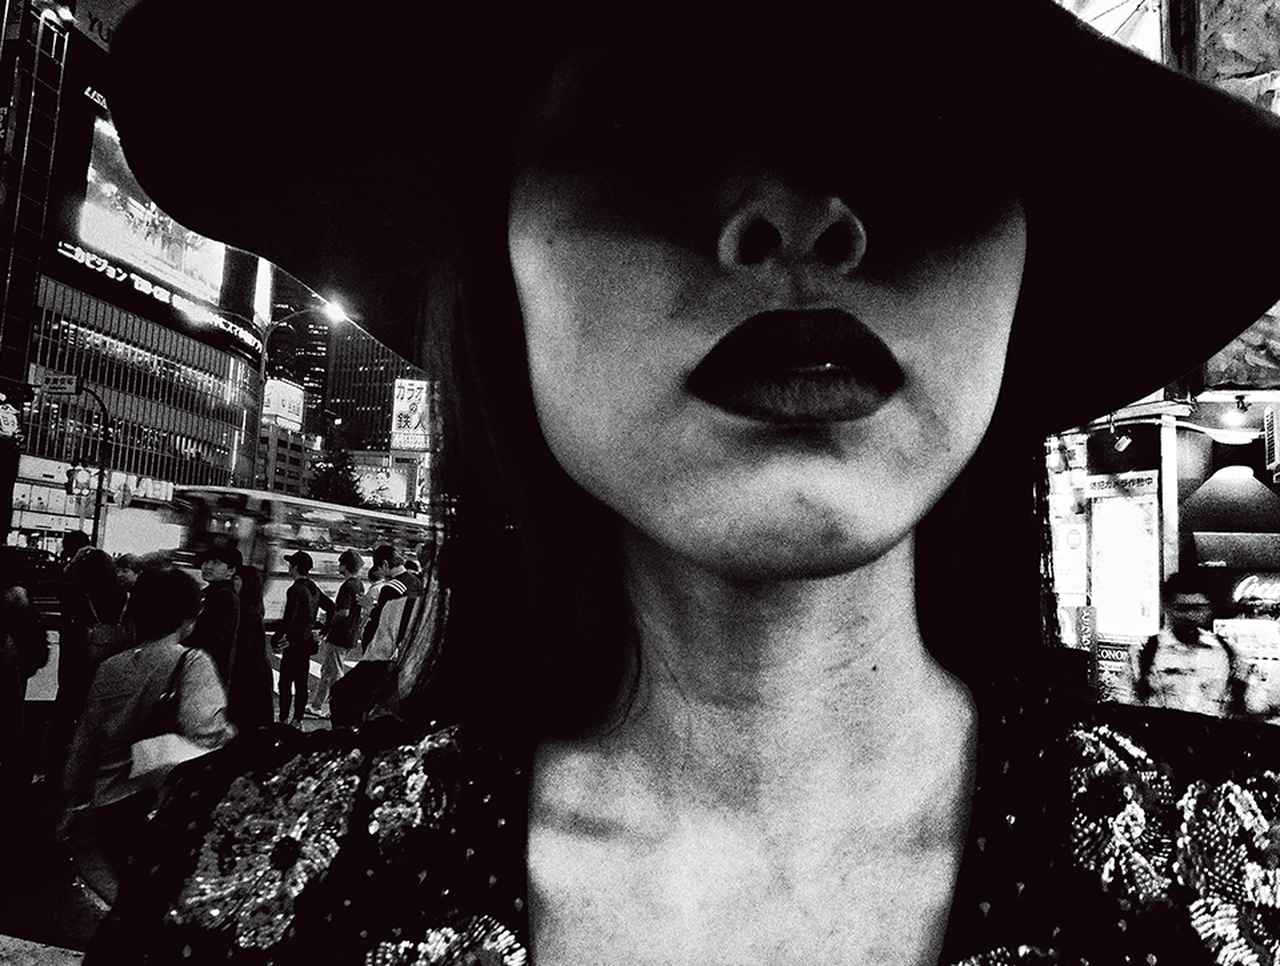 "Images : 6番目の画像 - 「都市の""欲望""を撮る 写真家・森山大道」のアルバム - T JAPAN:The New York Times Style Magazine 公式サイト"